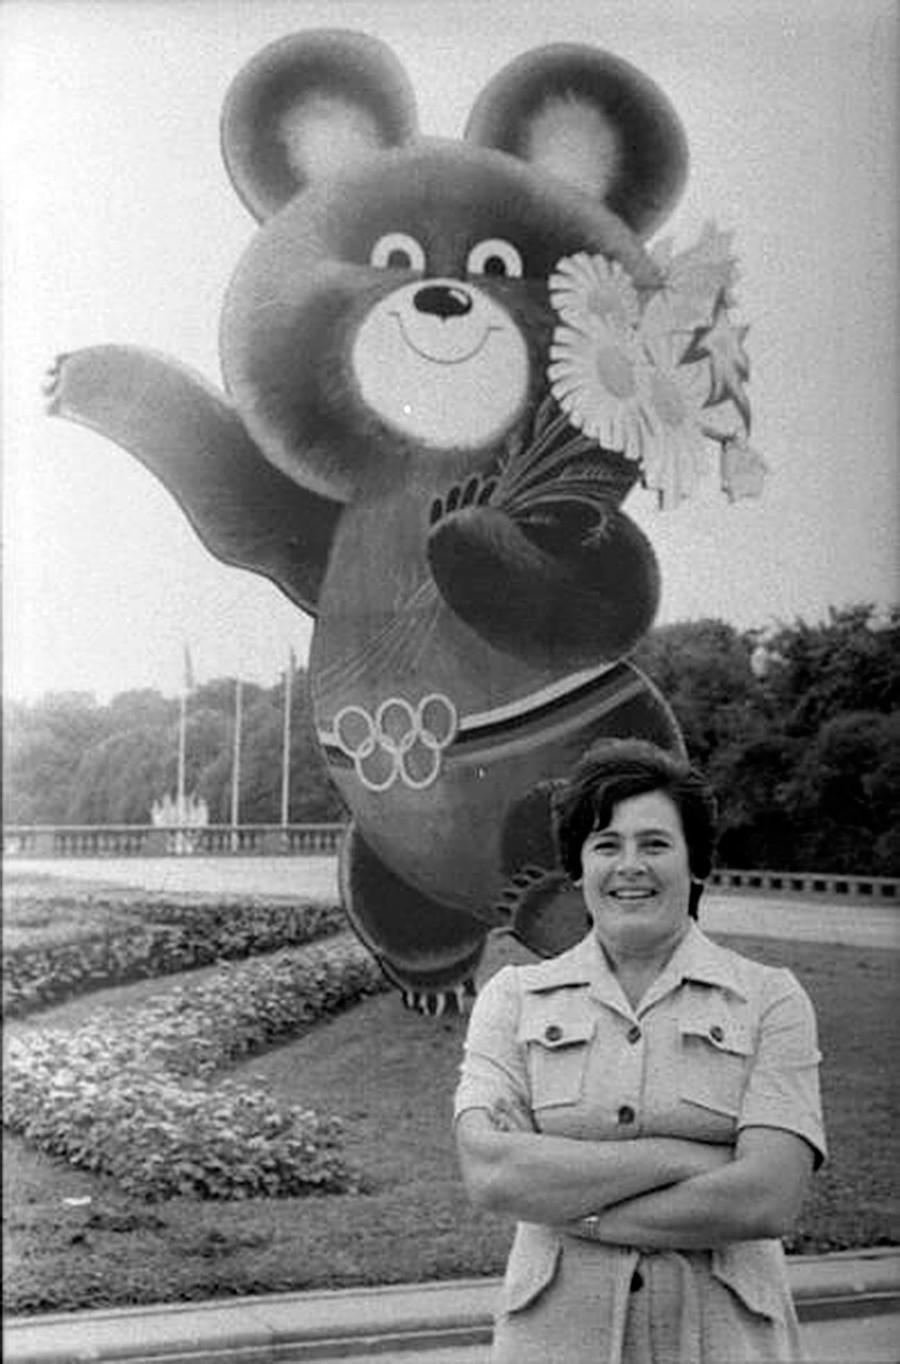 Potret seorang perempuan di depan Mishka, maskot Olimpiade Moskow 1980.